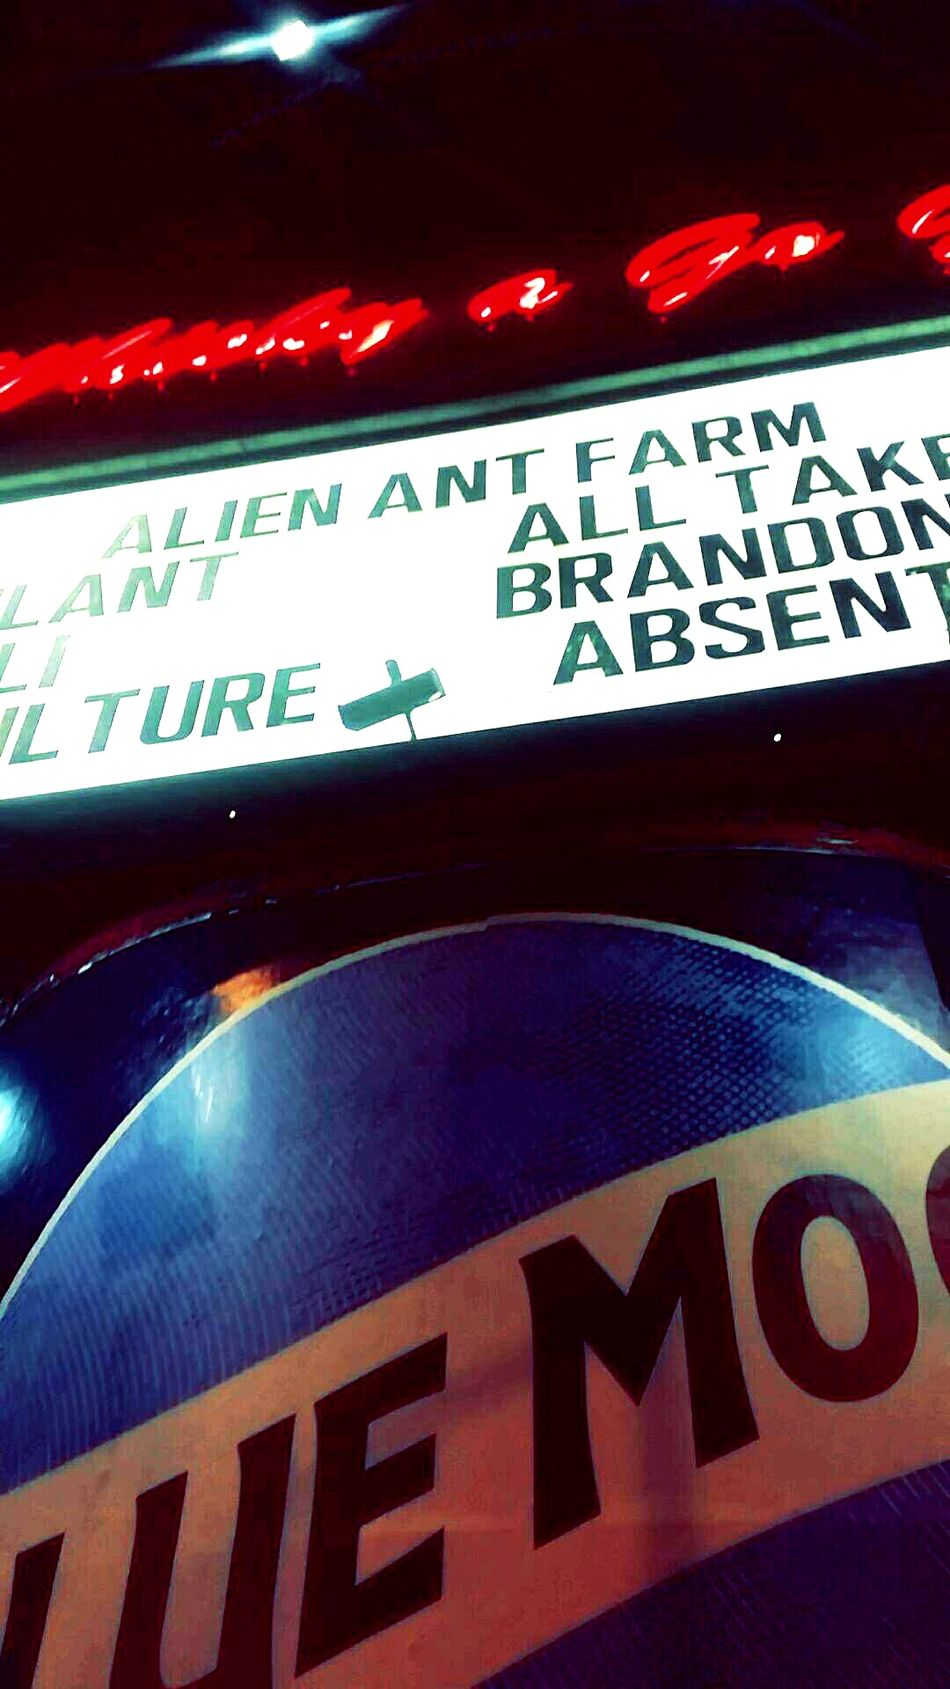 Music Bluemoon Tour Live Music Rock GoodTimes Justtakingpictures